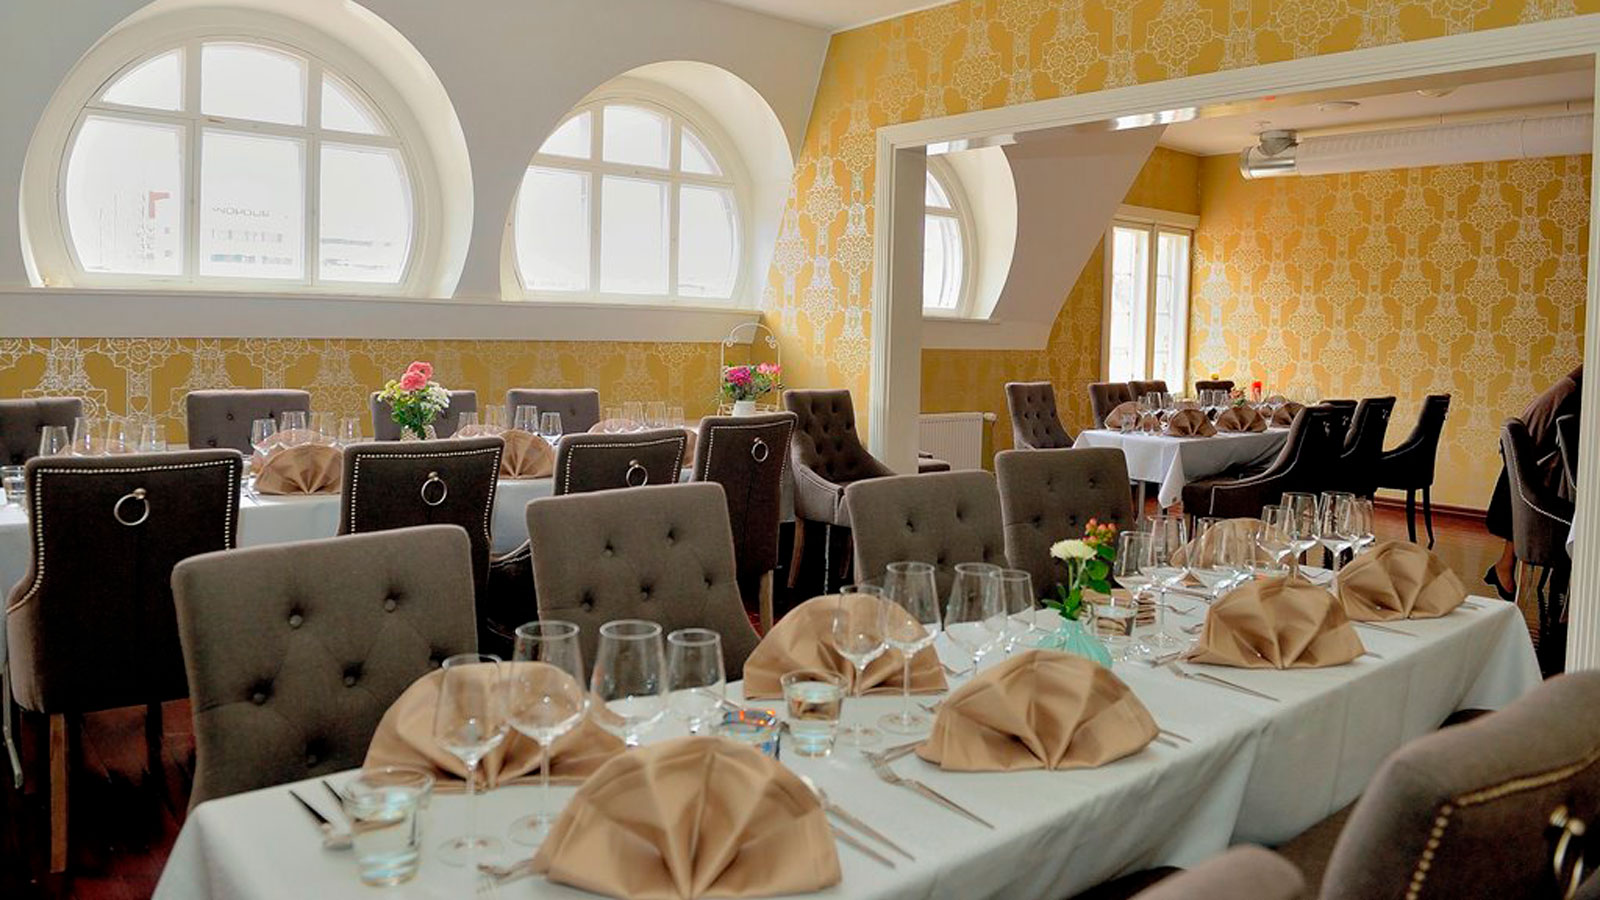 Restaurant Harmooni's tables.